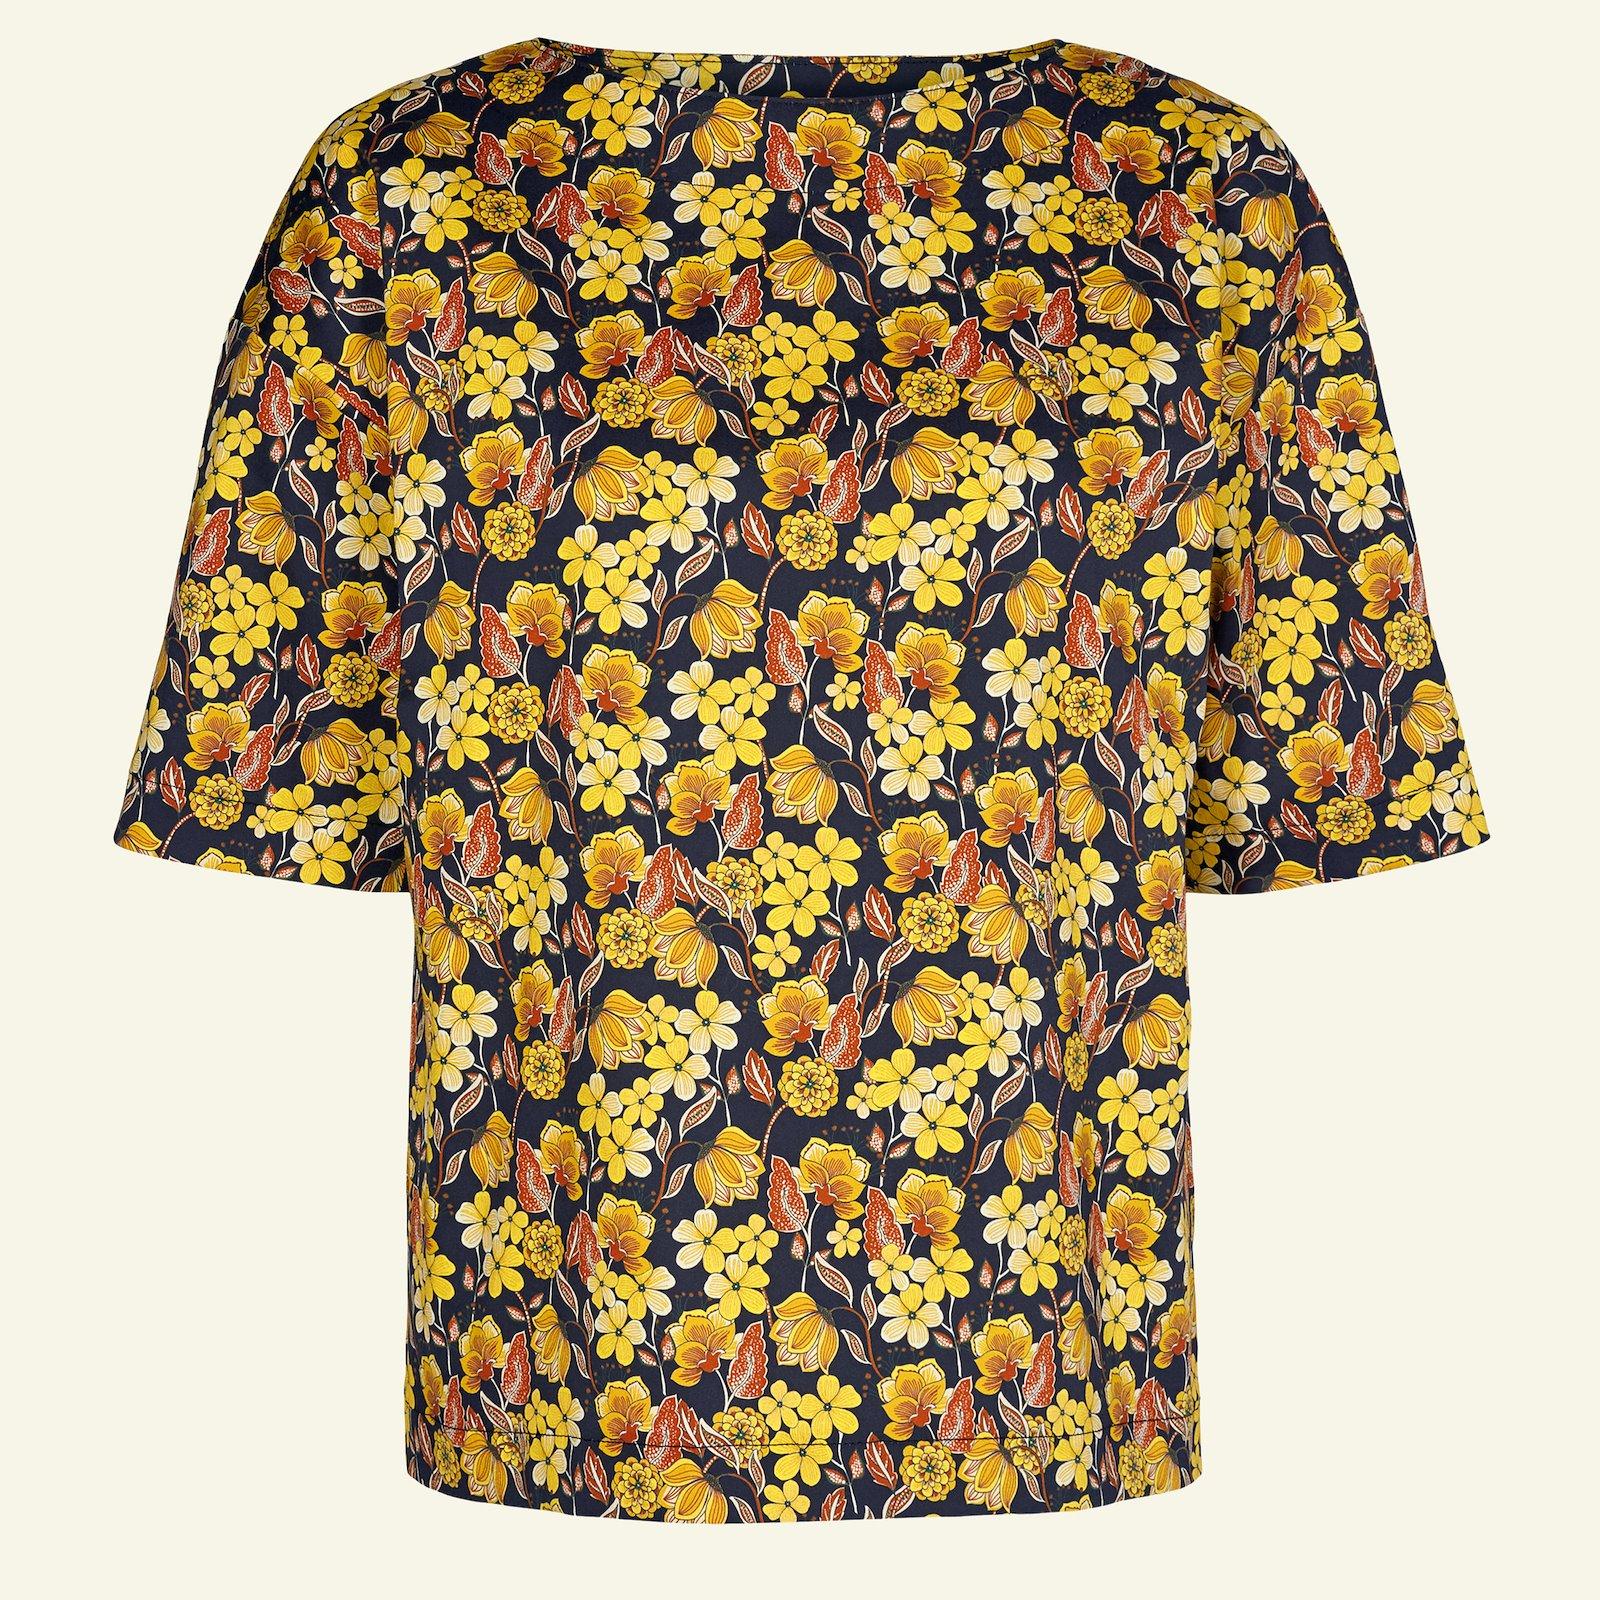 Dress and blouse, 44/16 p23161_460853_sskit